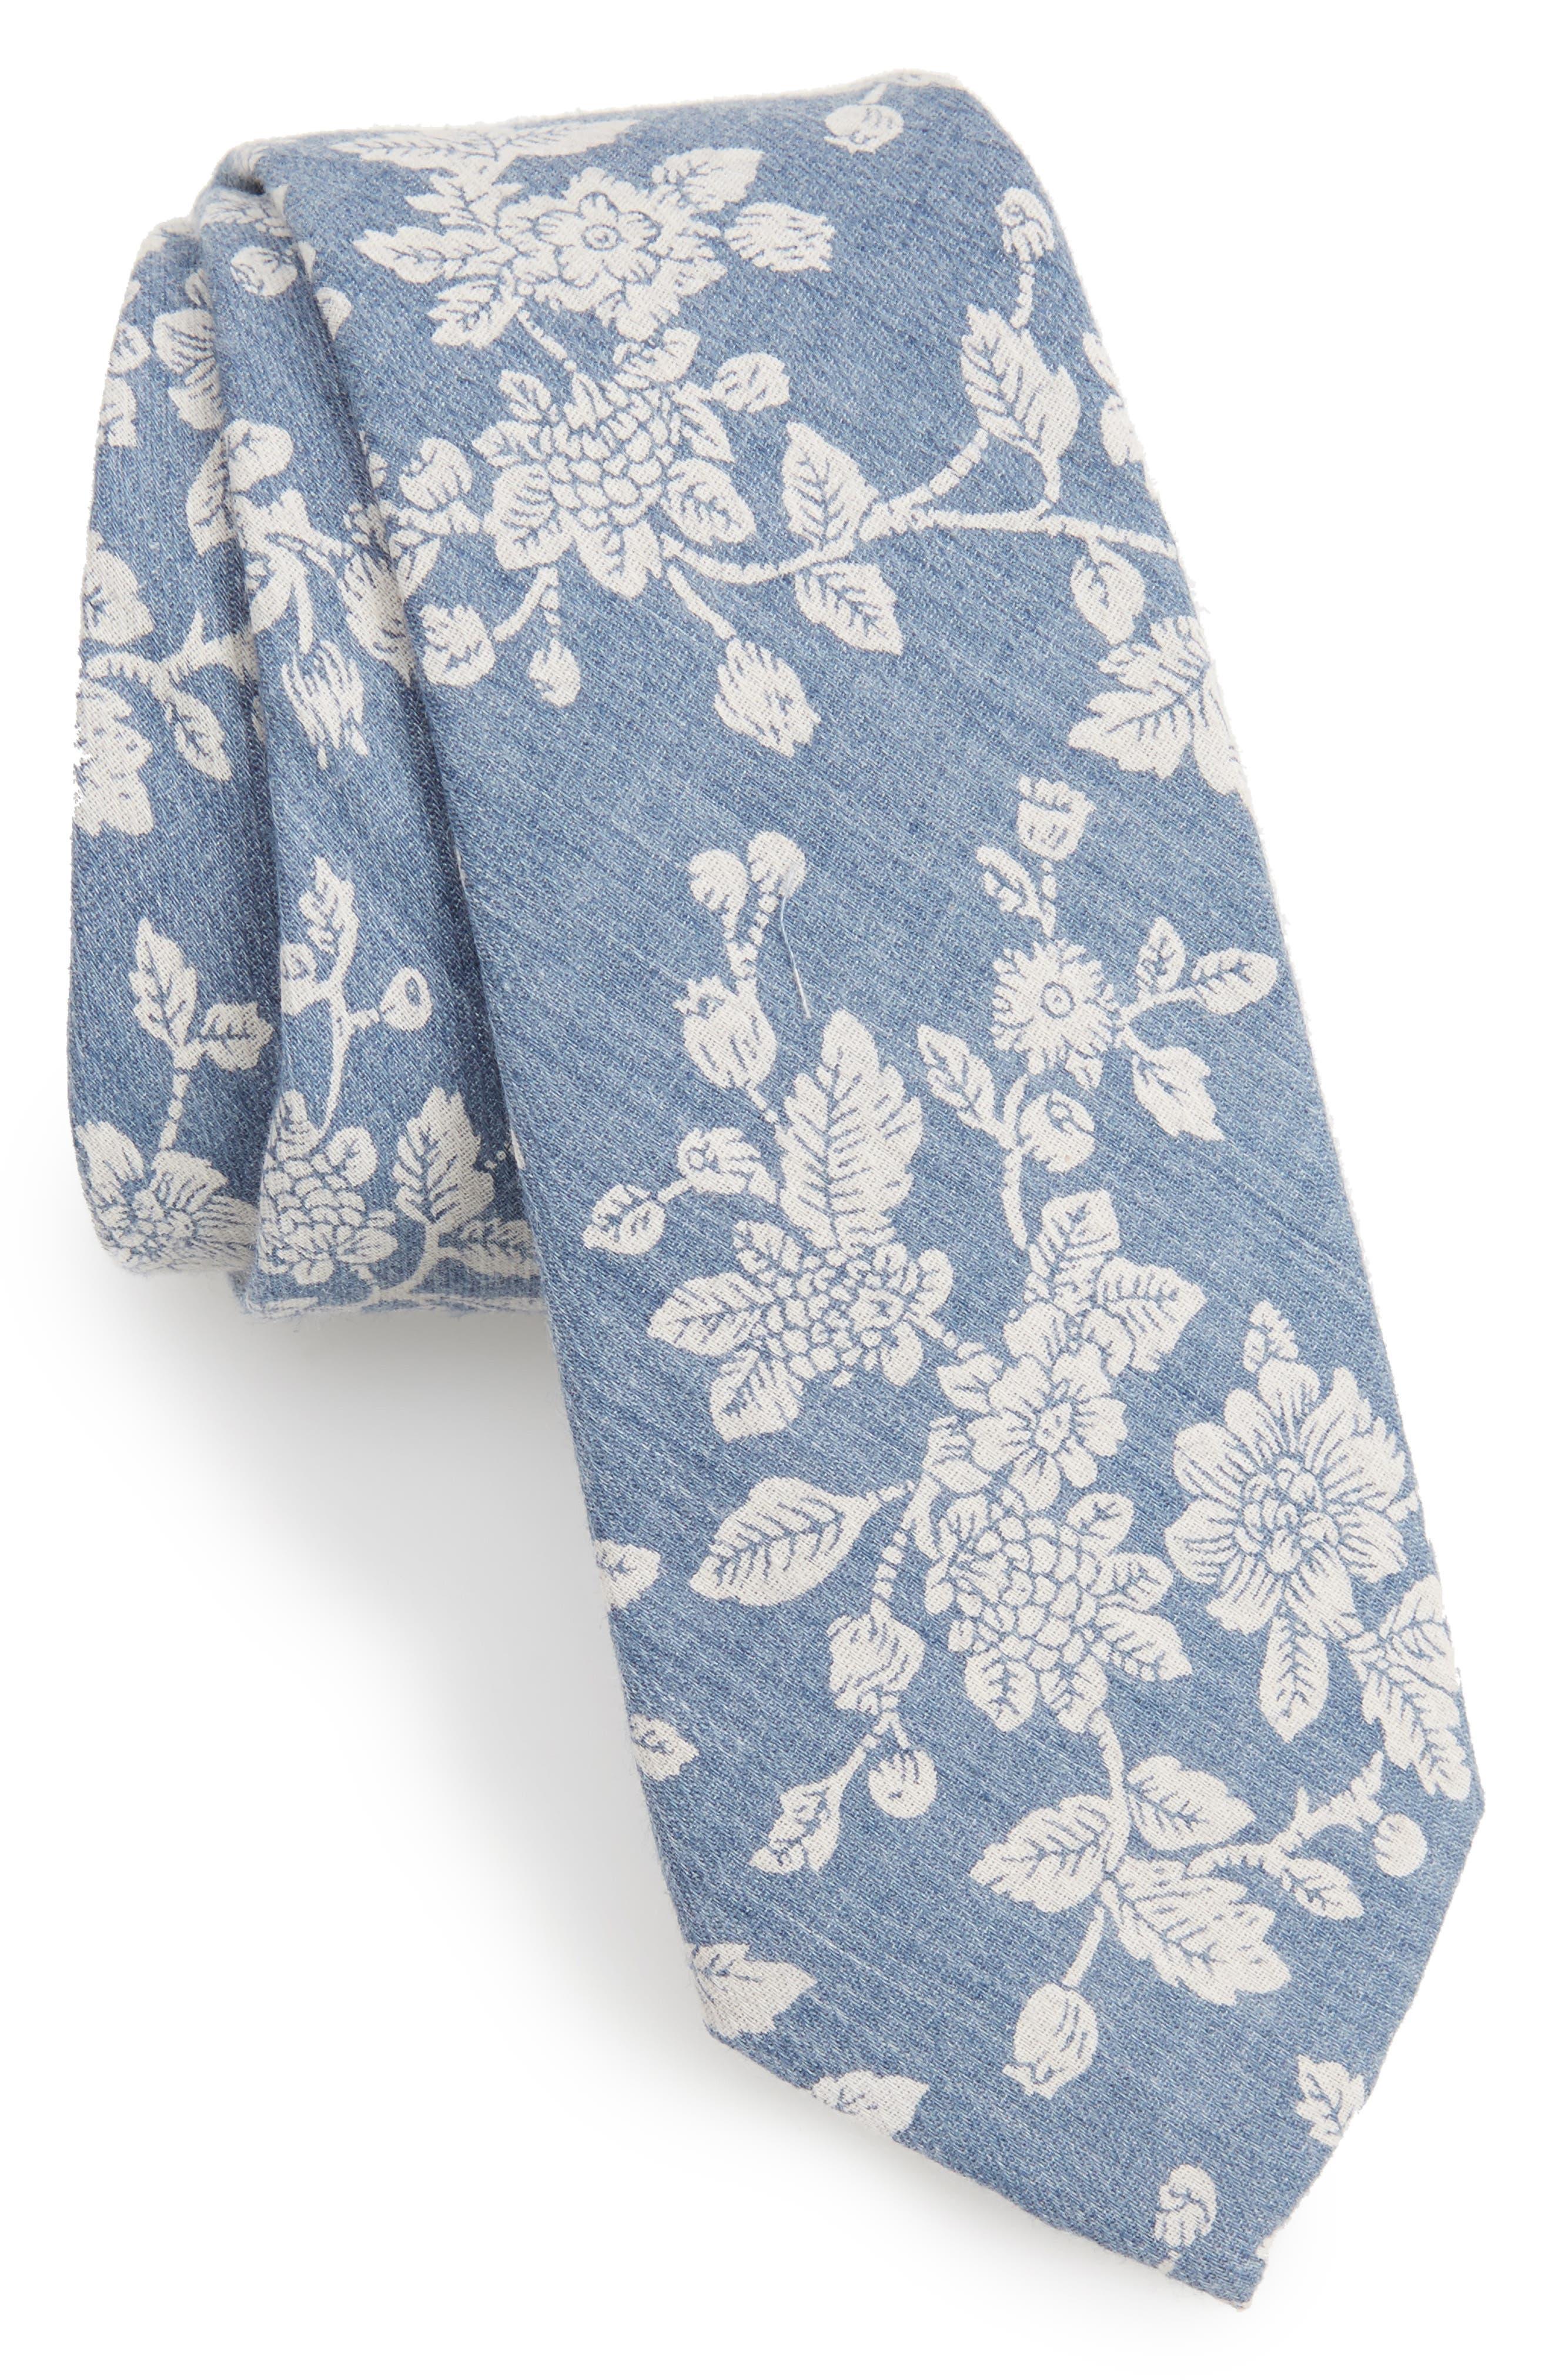 Floral Cotton Skinny Tie,                         Main,                         color, Blue1